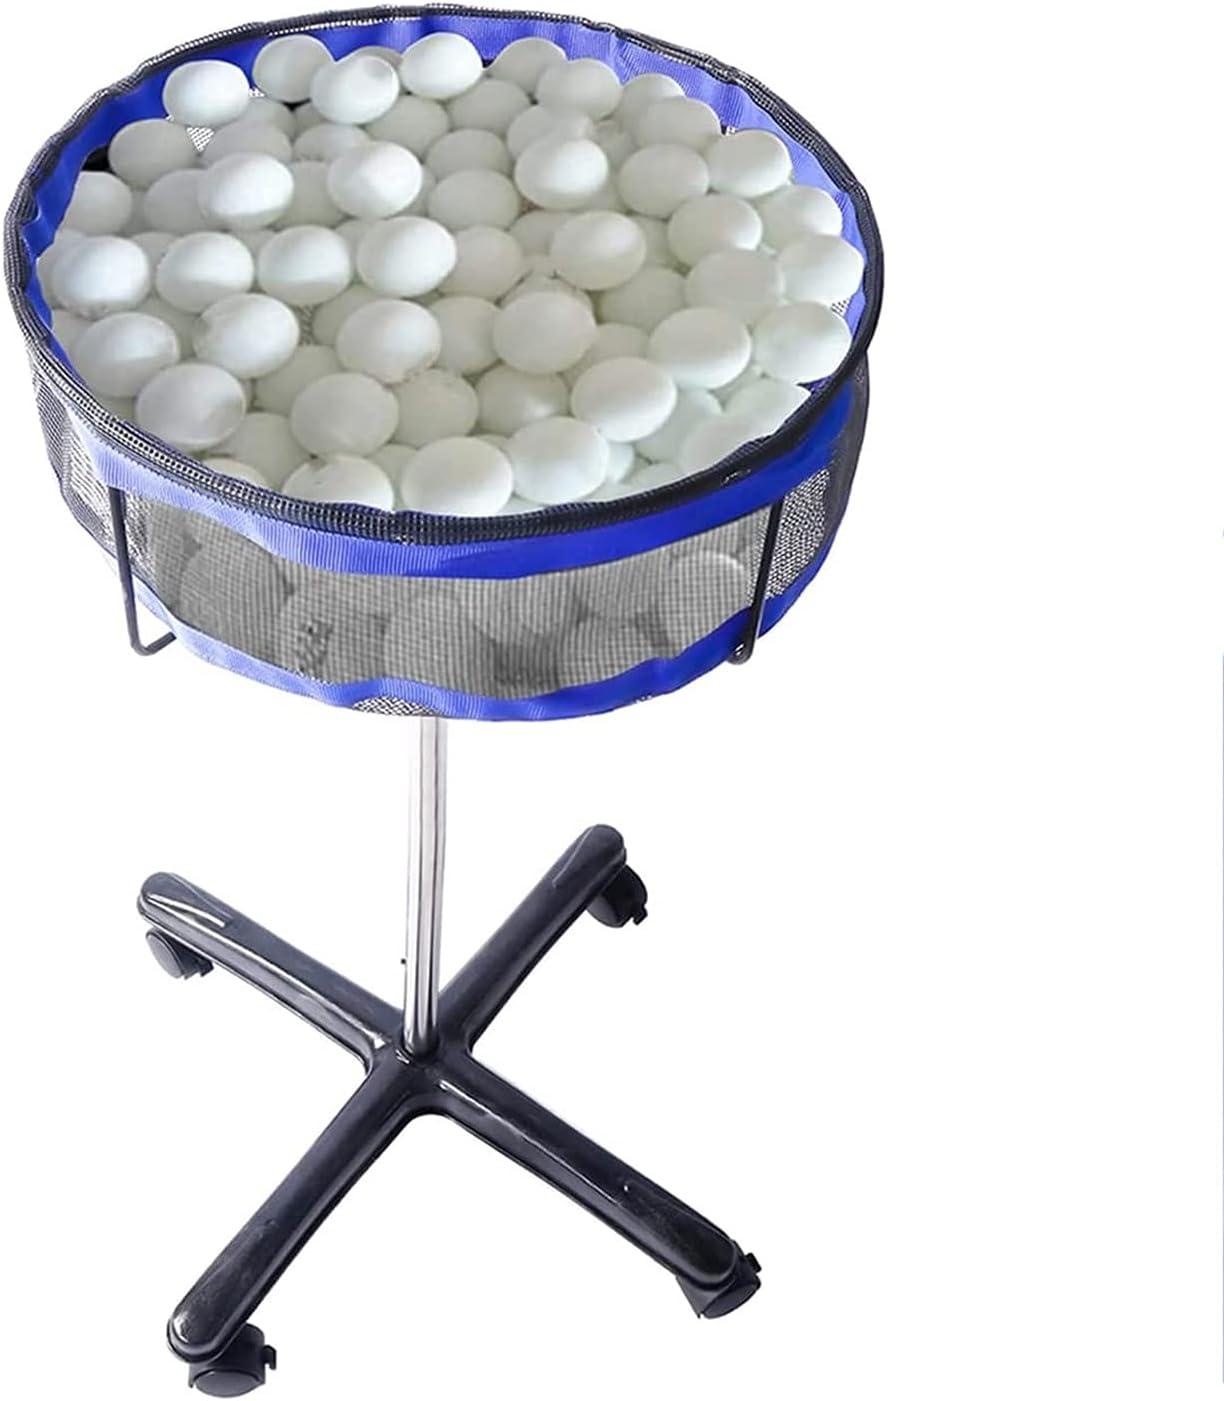 JYGHM Soporte de Almacenamiento de Bola múltiple, colector de Bolas de Ping Pong, colector de Pelota de Tenis, Titular de Pelota de Tenis Ajustable en Altura con Estuche de Malla, para Pelota de Golf